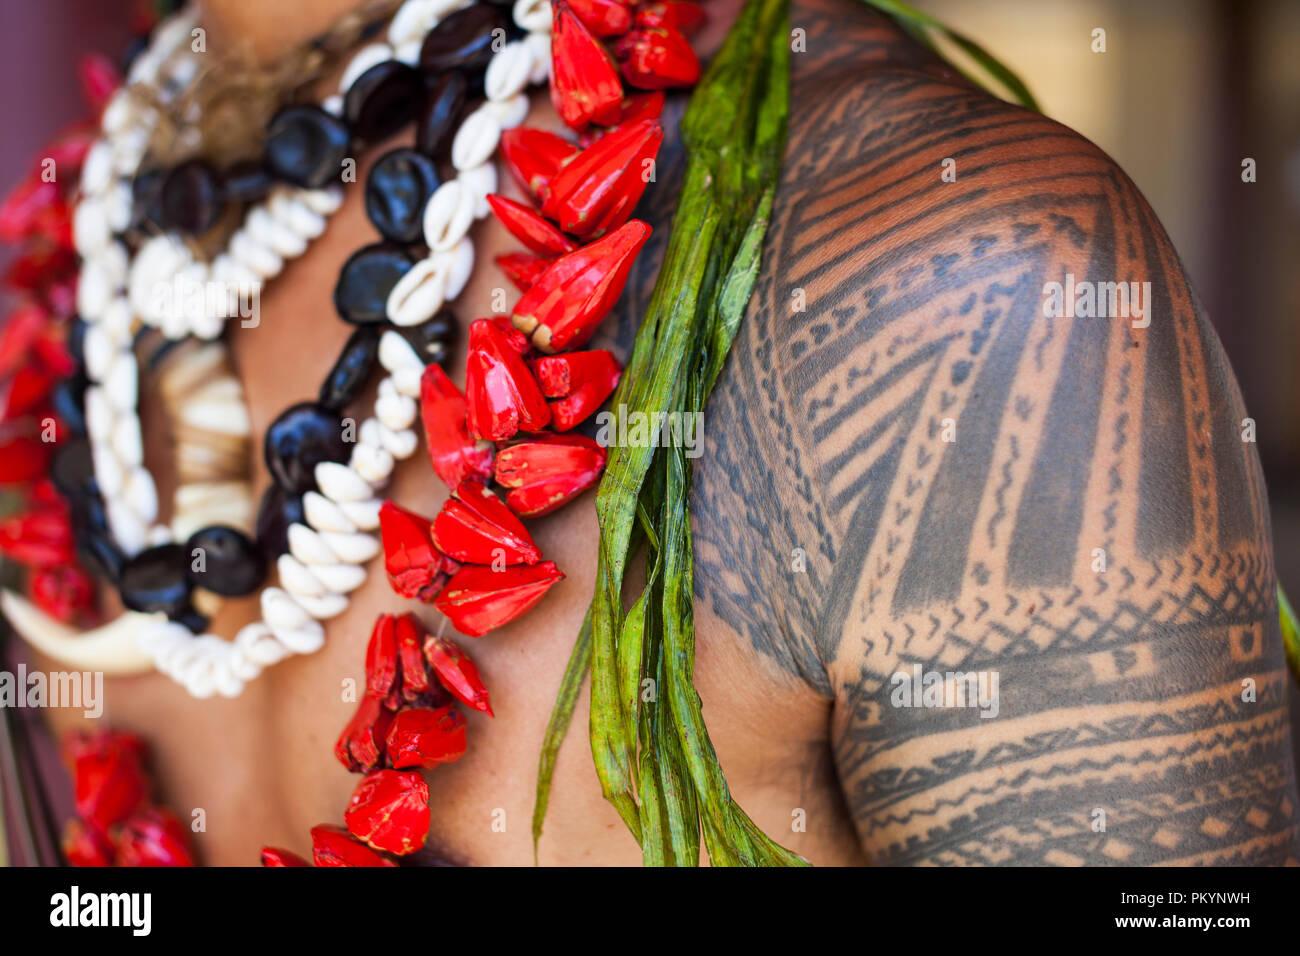 Local Samoan Chris 'Kilisi' Solamon wearing ulas (garlands) of seeds and shells. - Stock Image